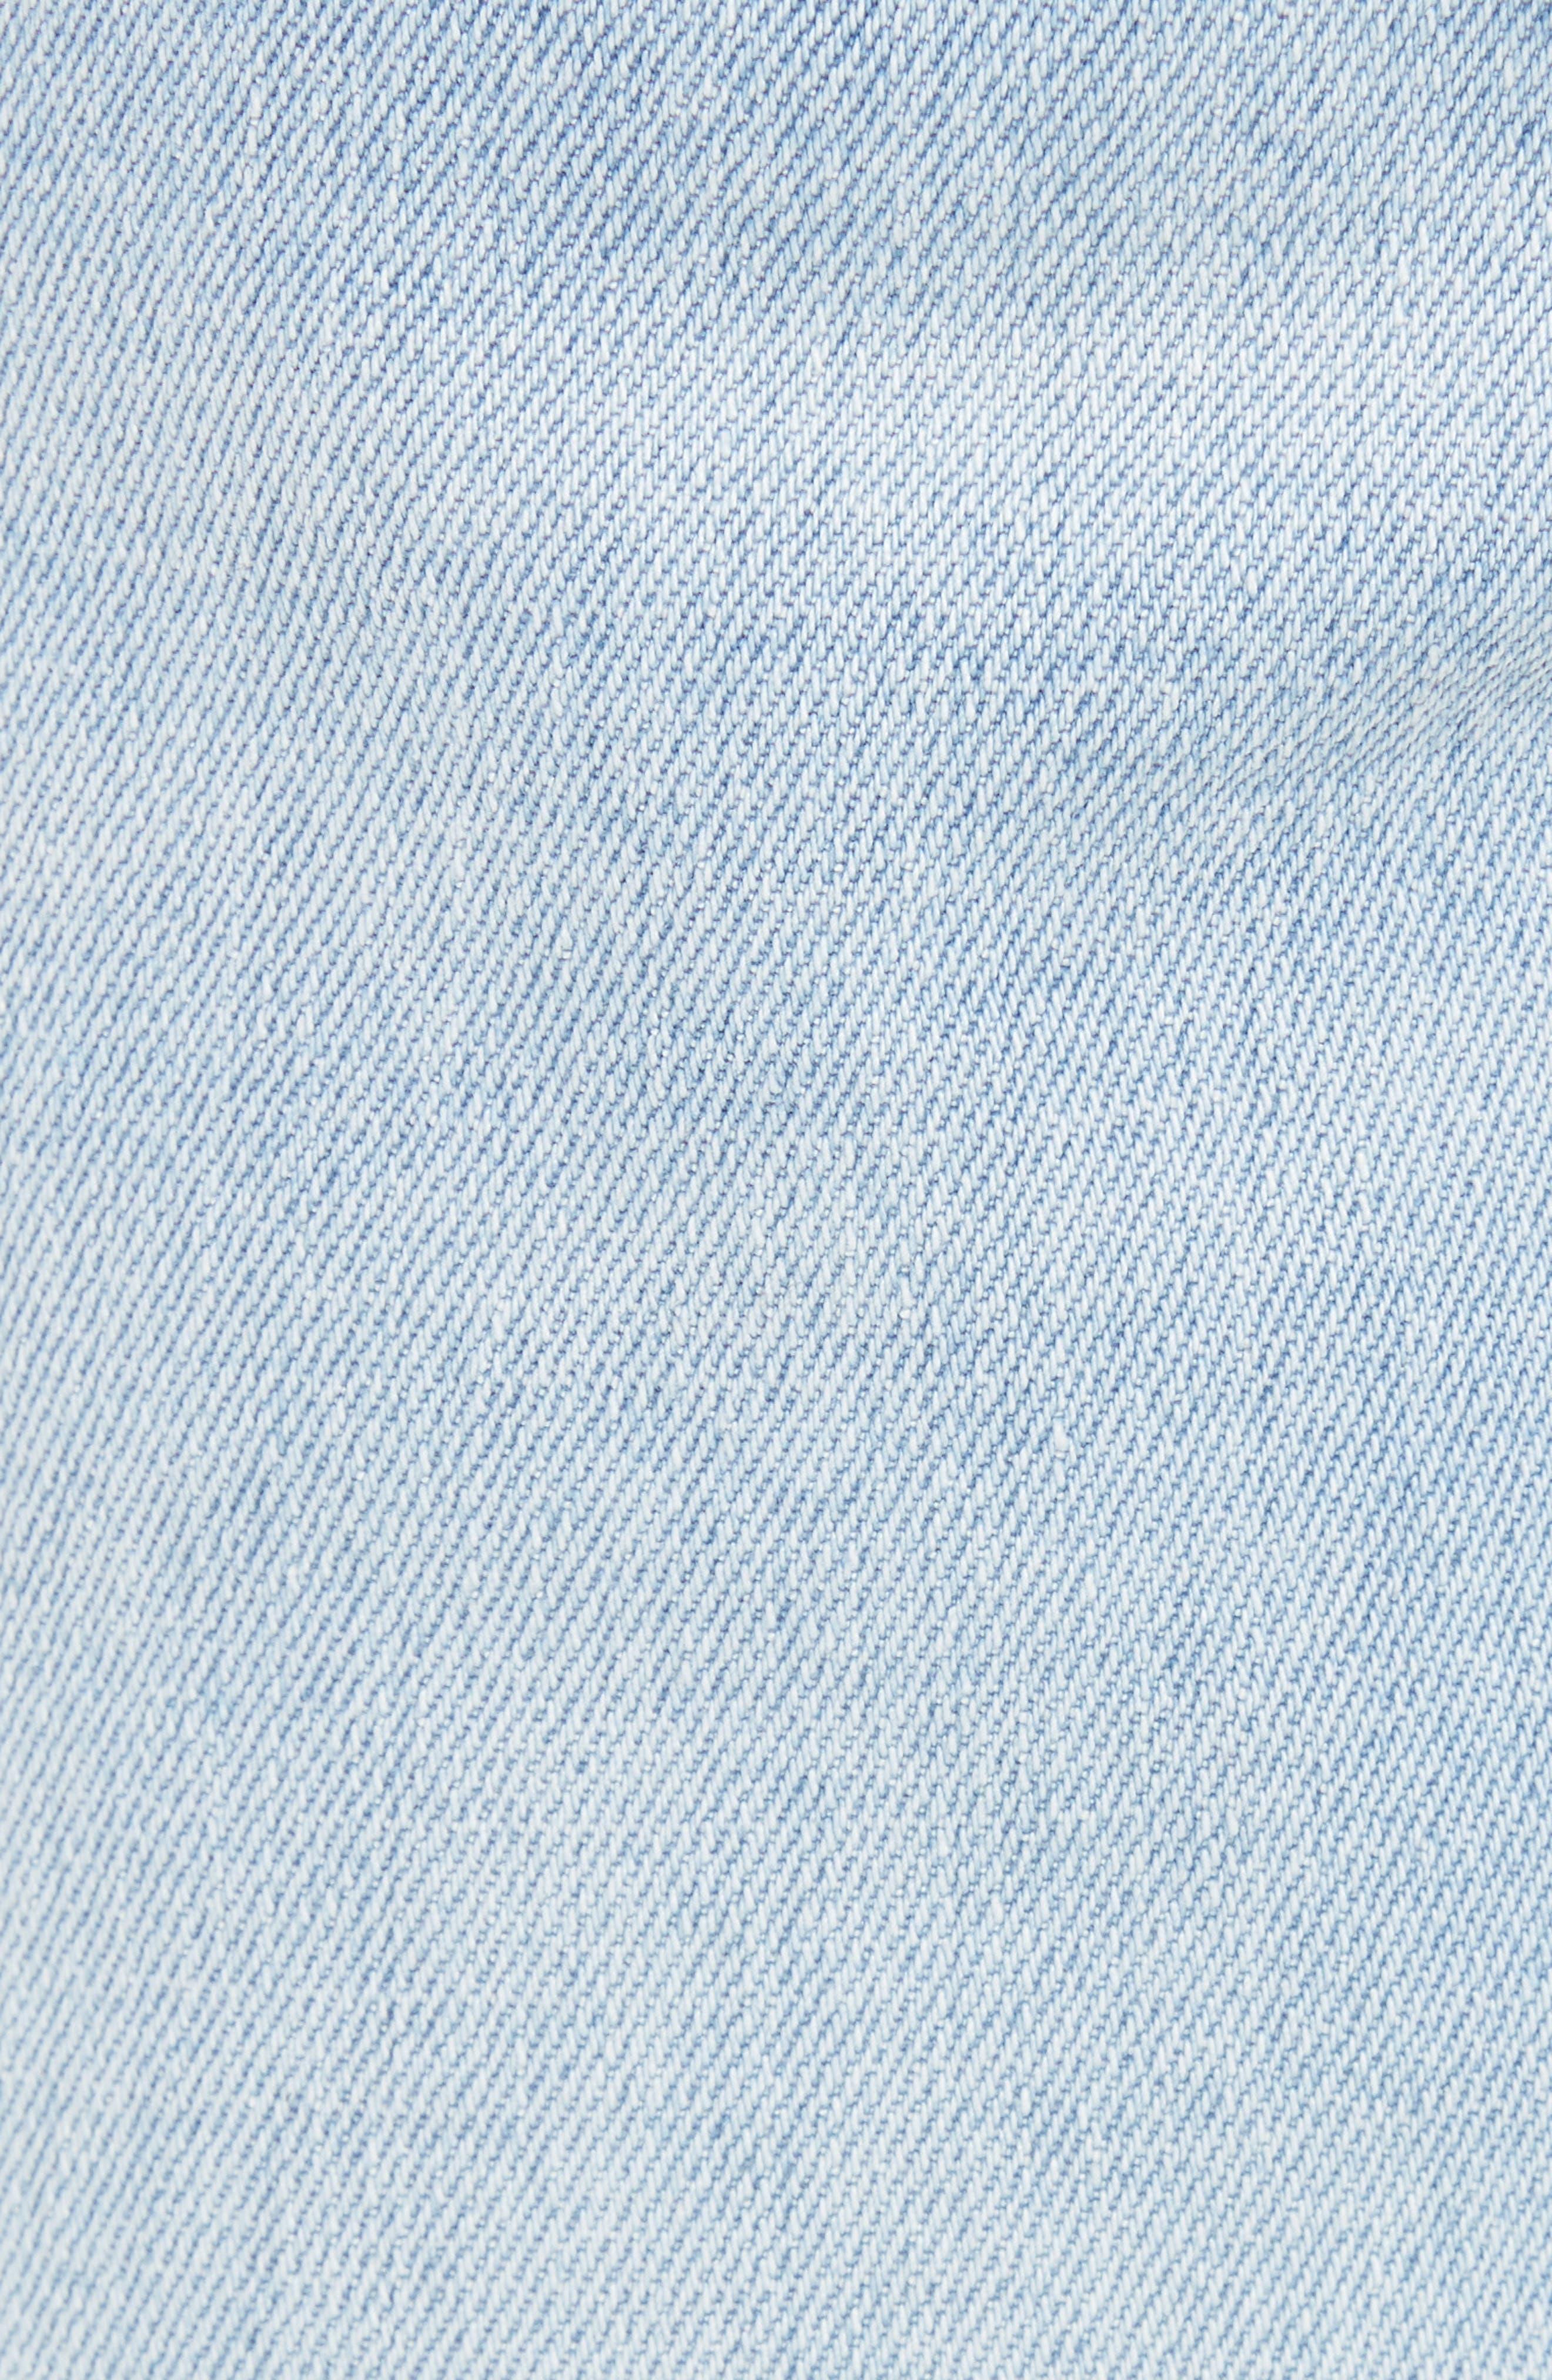 ,                             Ripped Skinny Jeans,                             Alternate thumbnail 6, color,                             BLUE CORGAN WASH